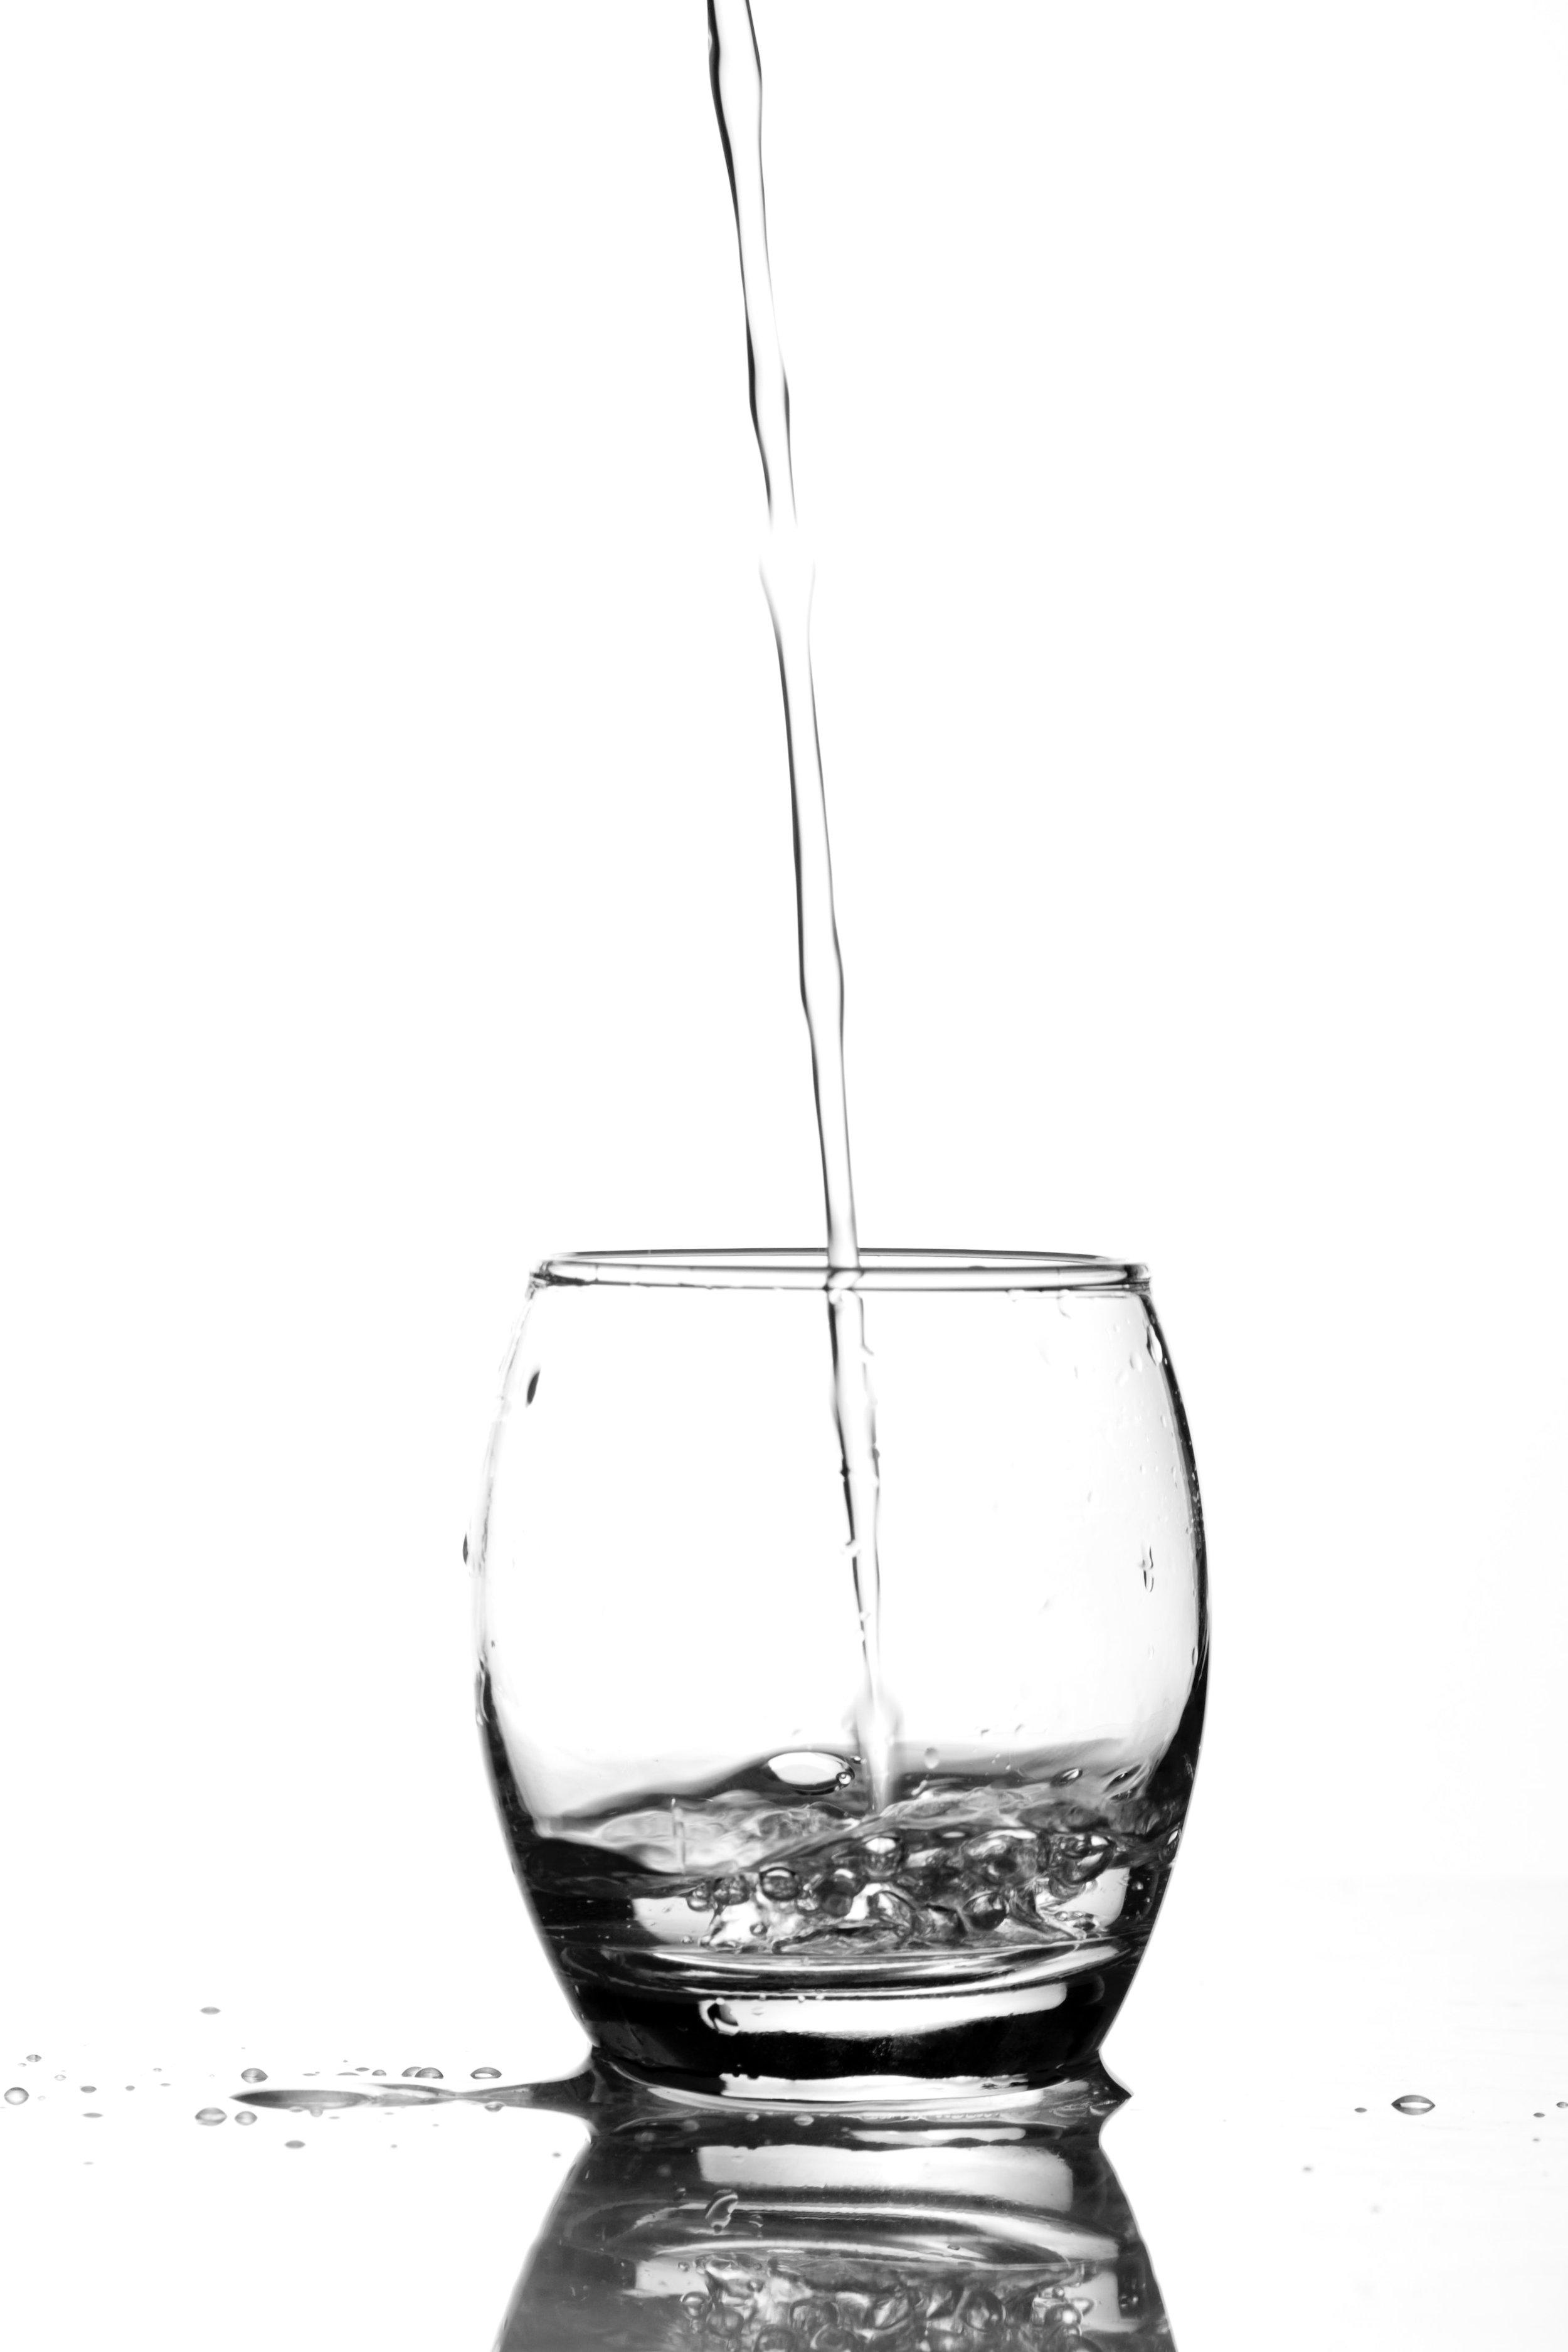 Drink Water - weight lossdetoxification and heart healthskin appearance